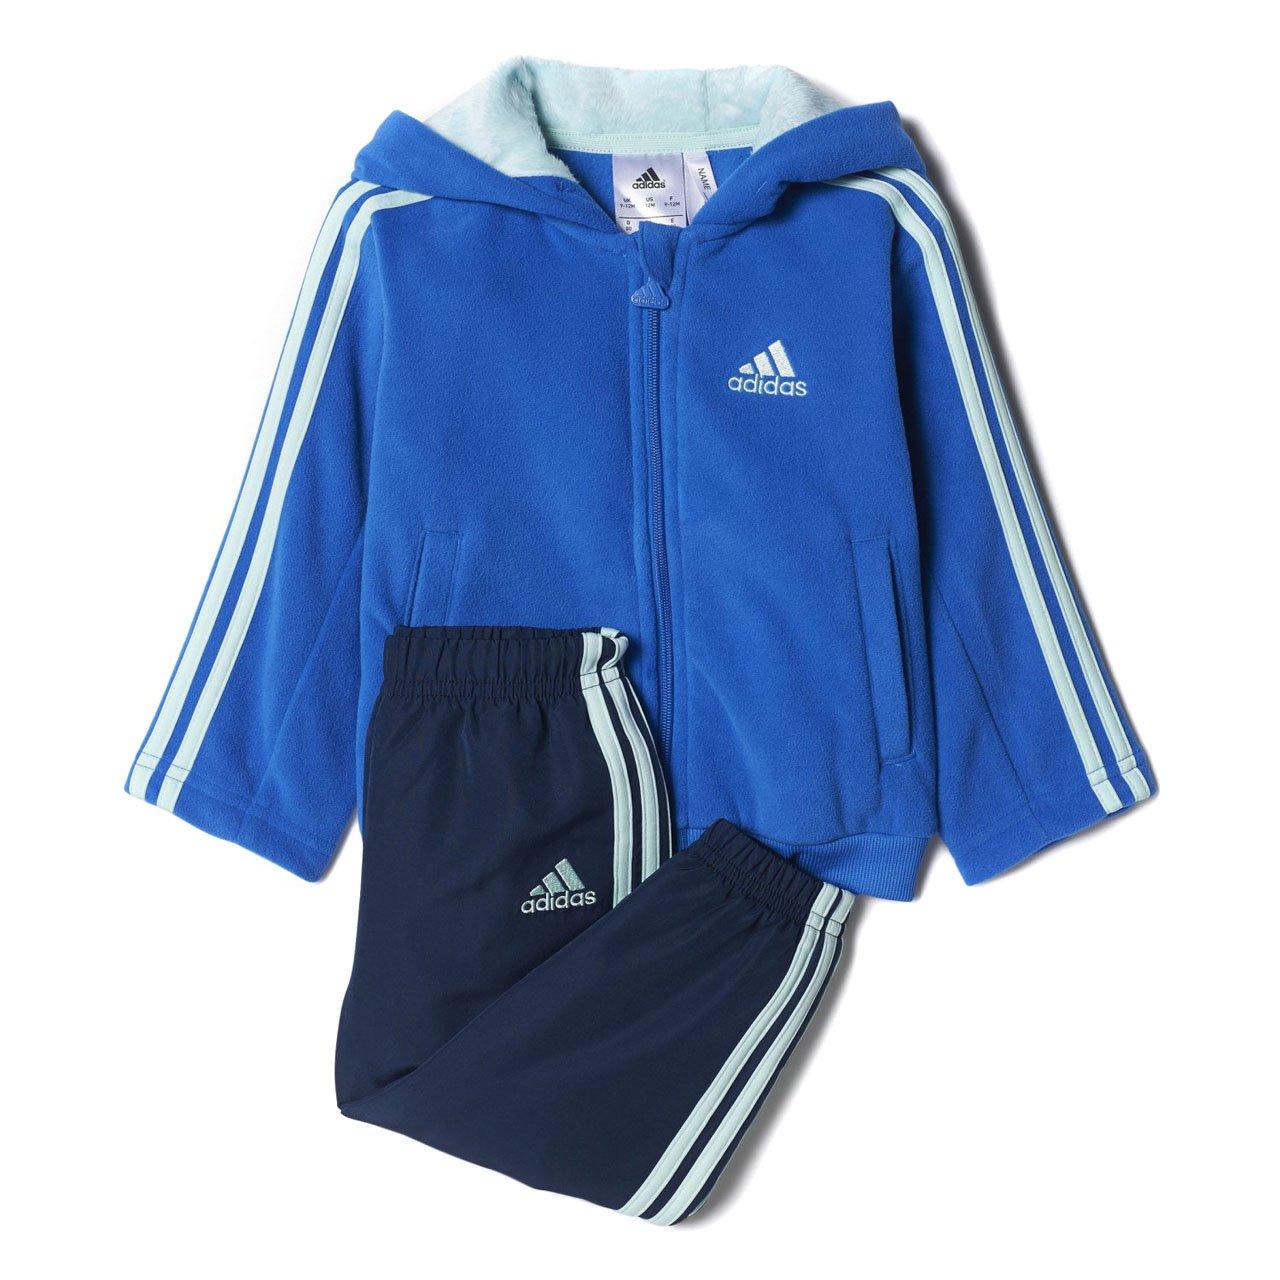 adidas Klein Kinder Trainingsanzug Winter Fun Jogger blau